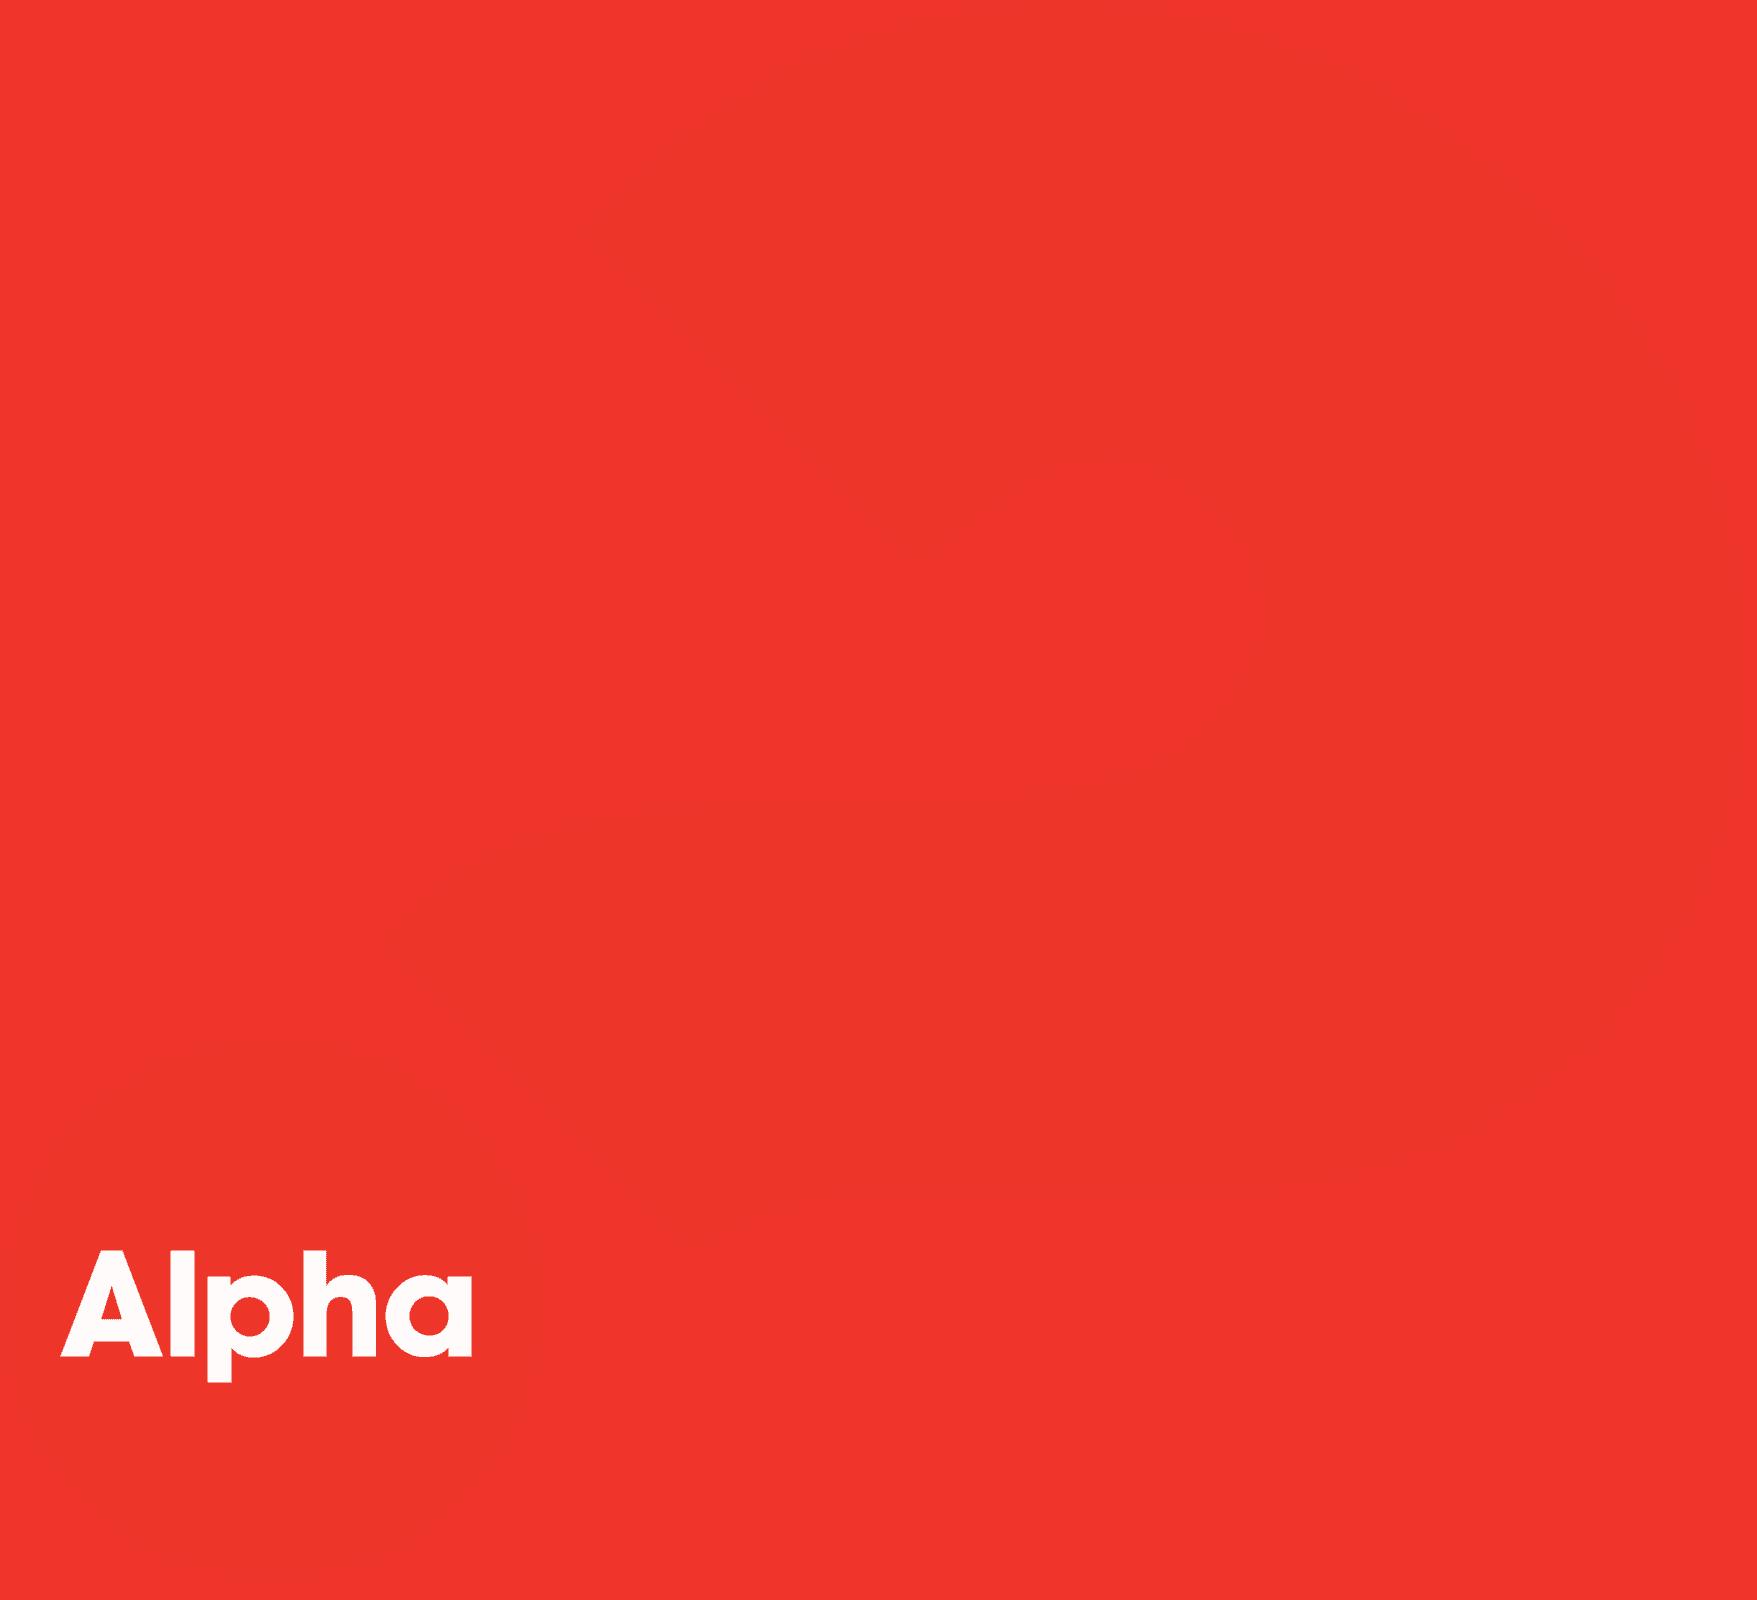 Alpha Mark png